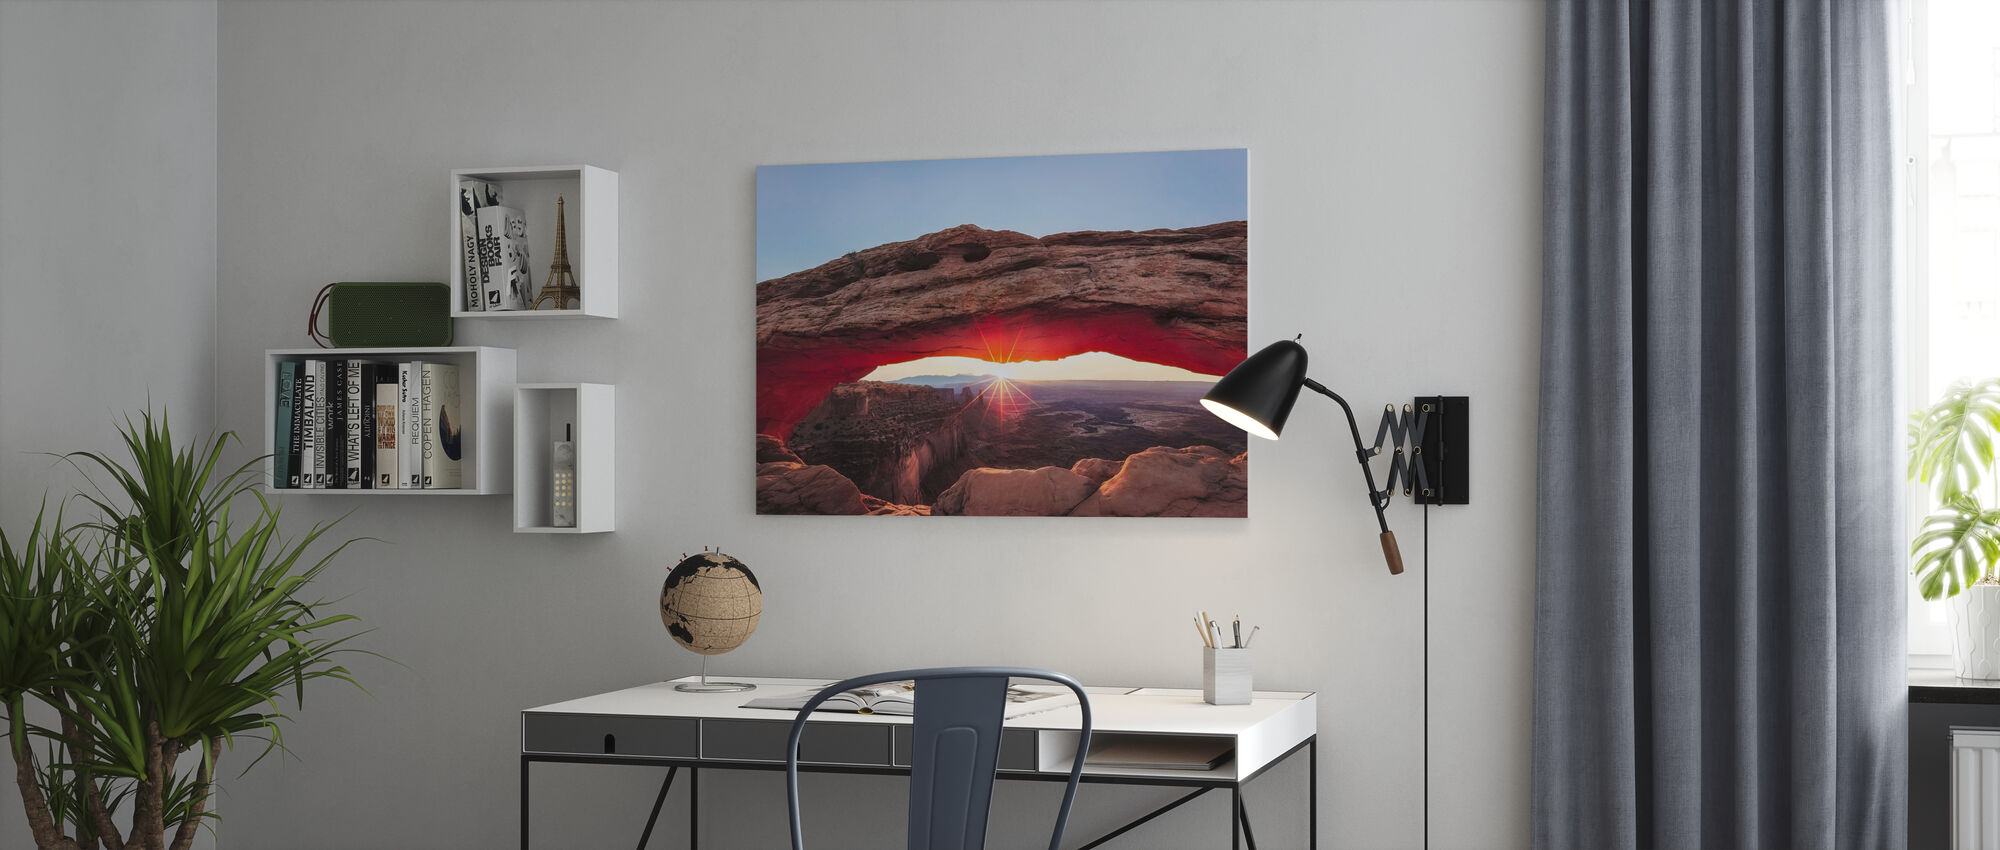 Sunset Crest - Canvas print - Office